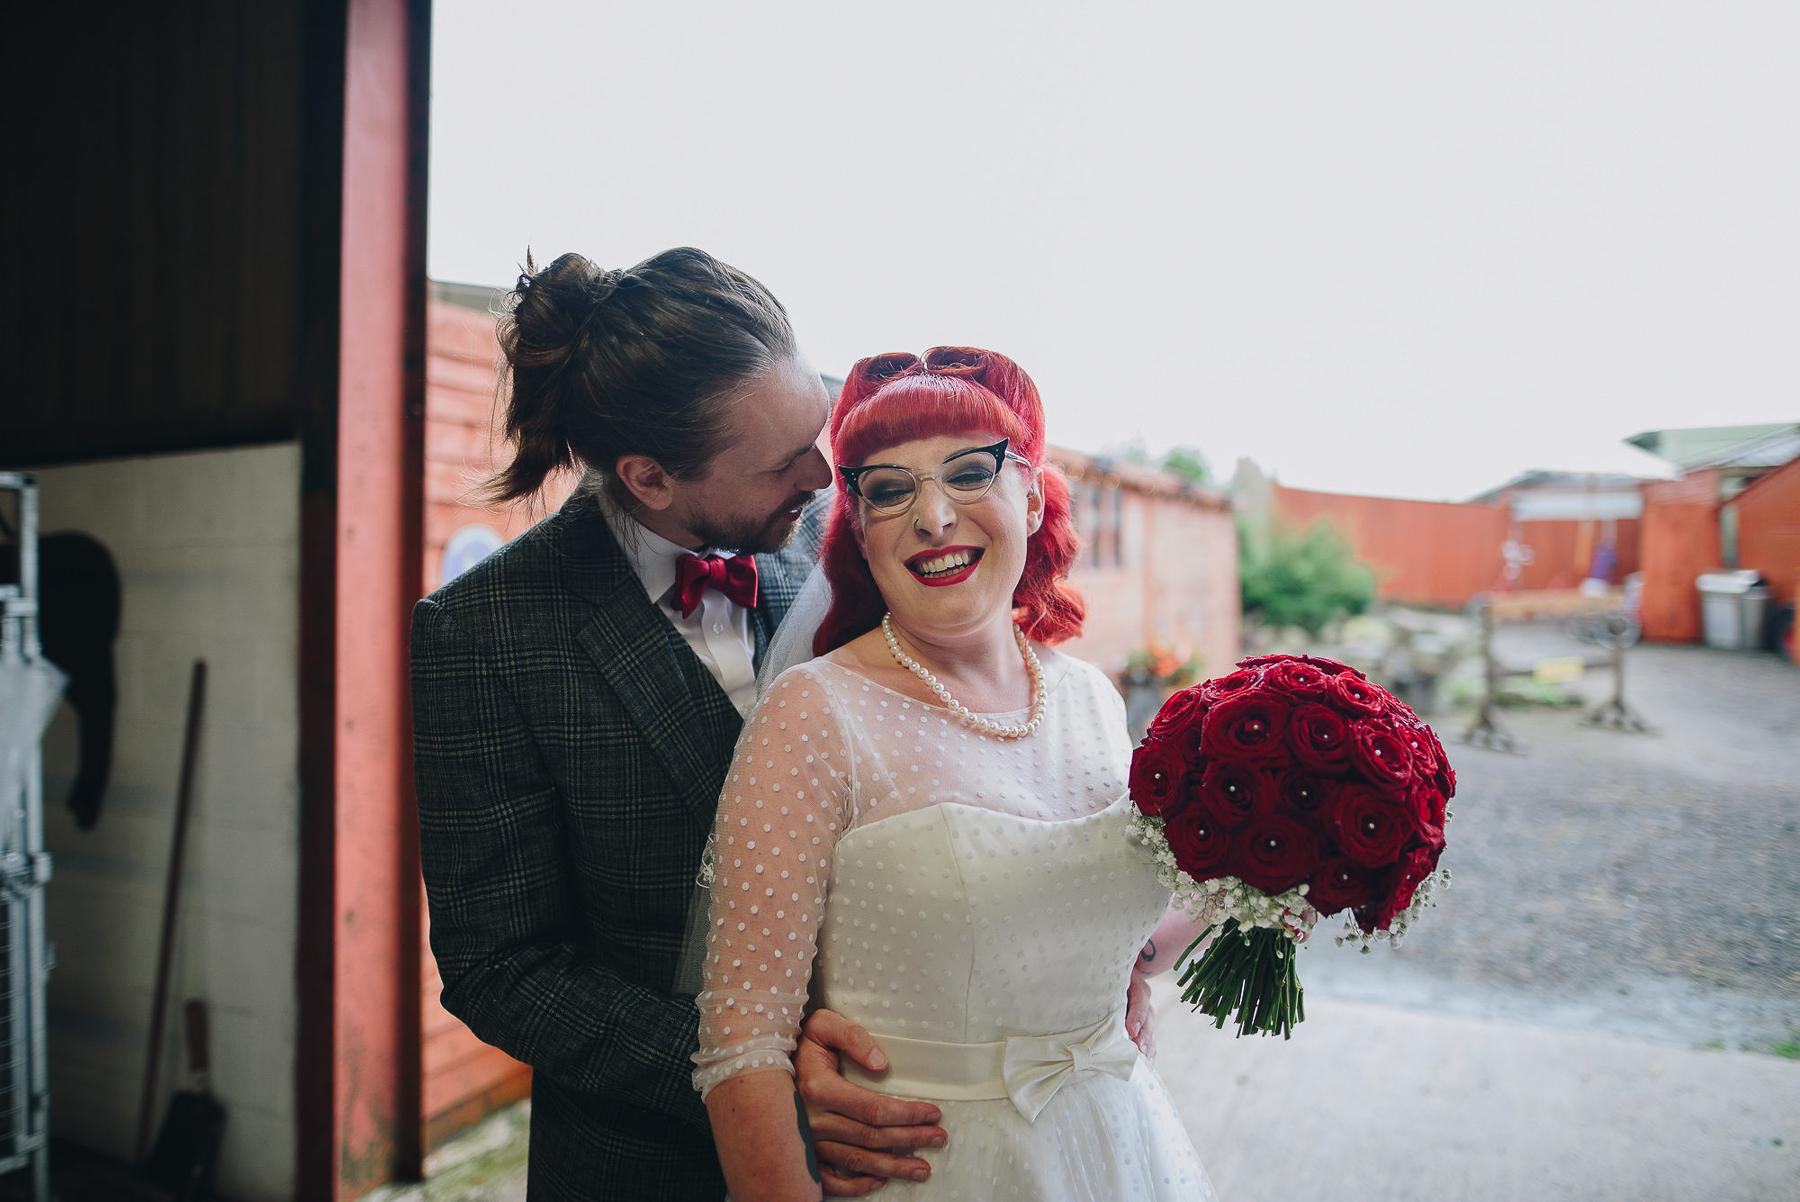 Wellbeing_Farm_Wedding_Photography_The_Pin-Up_Bride_Lara_Shaun-87.jpg